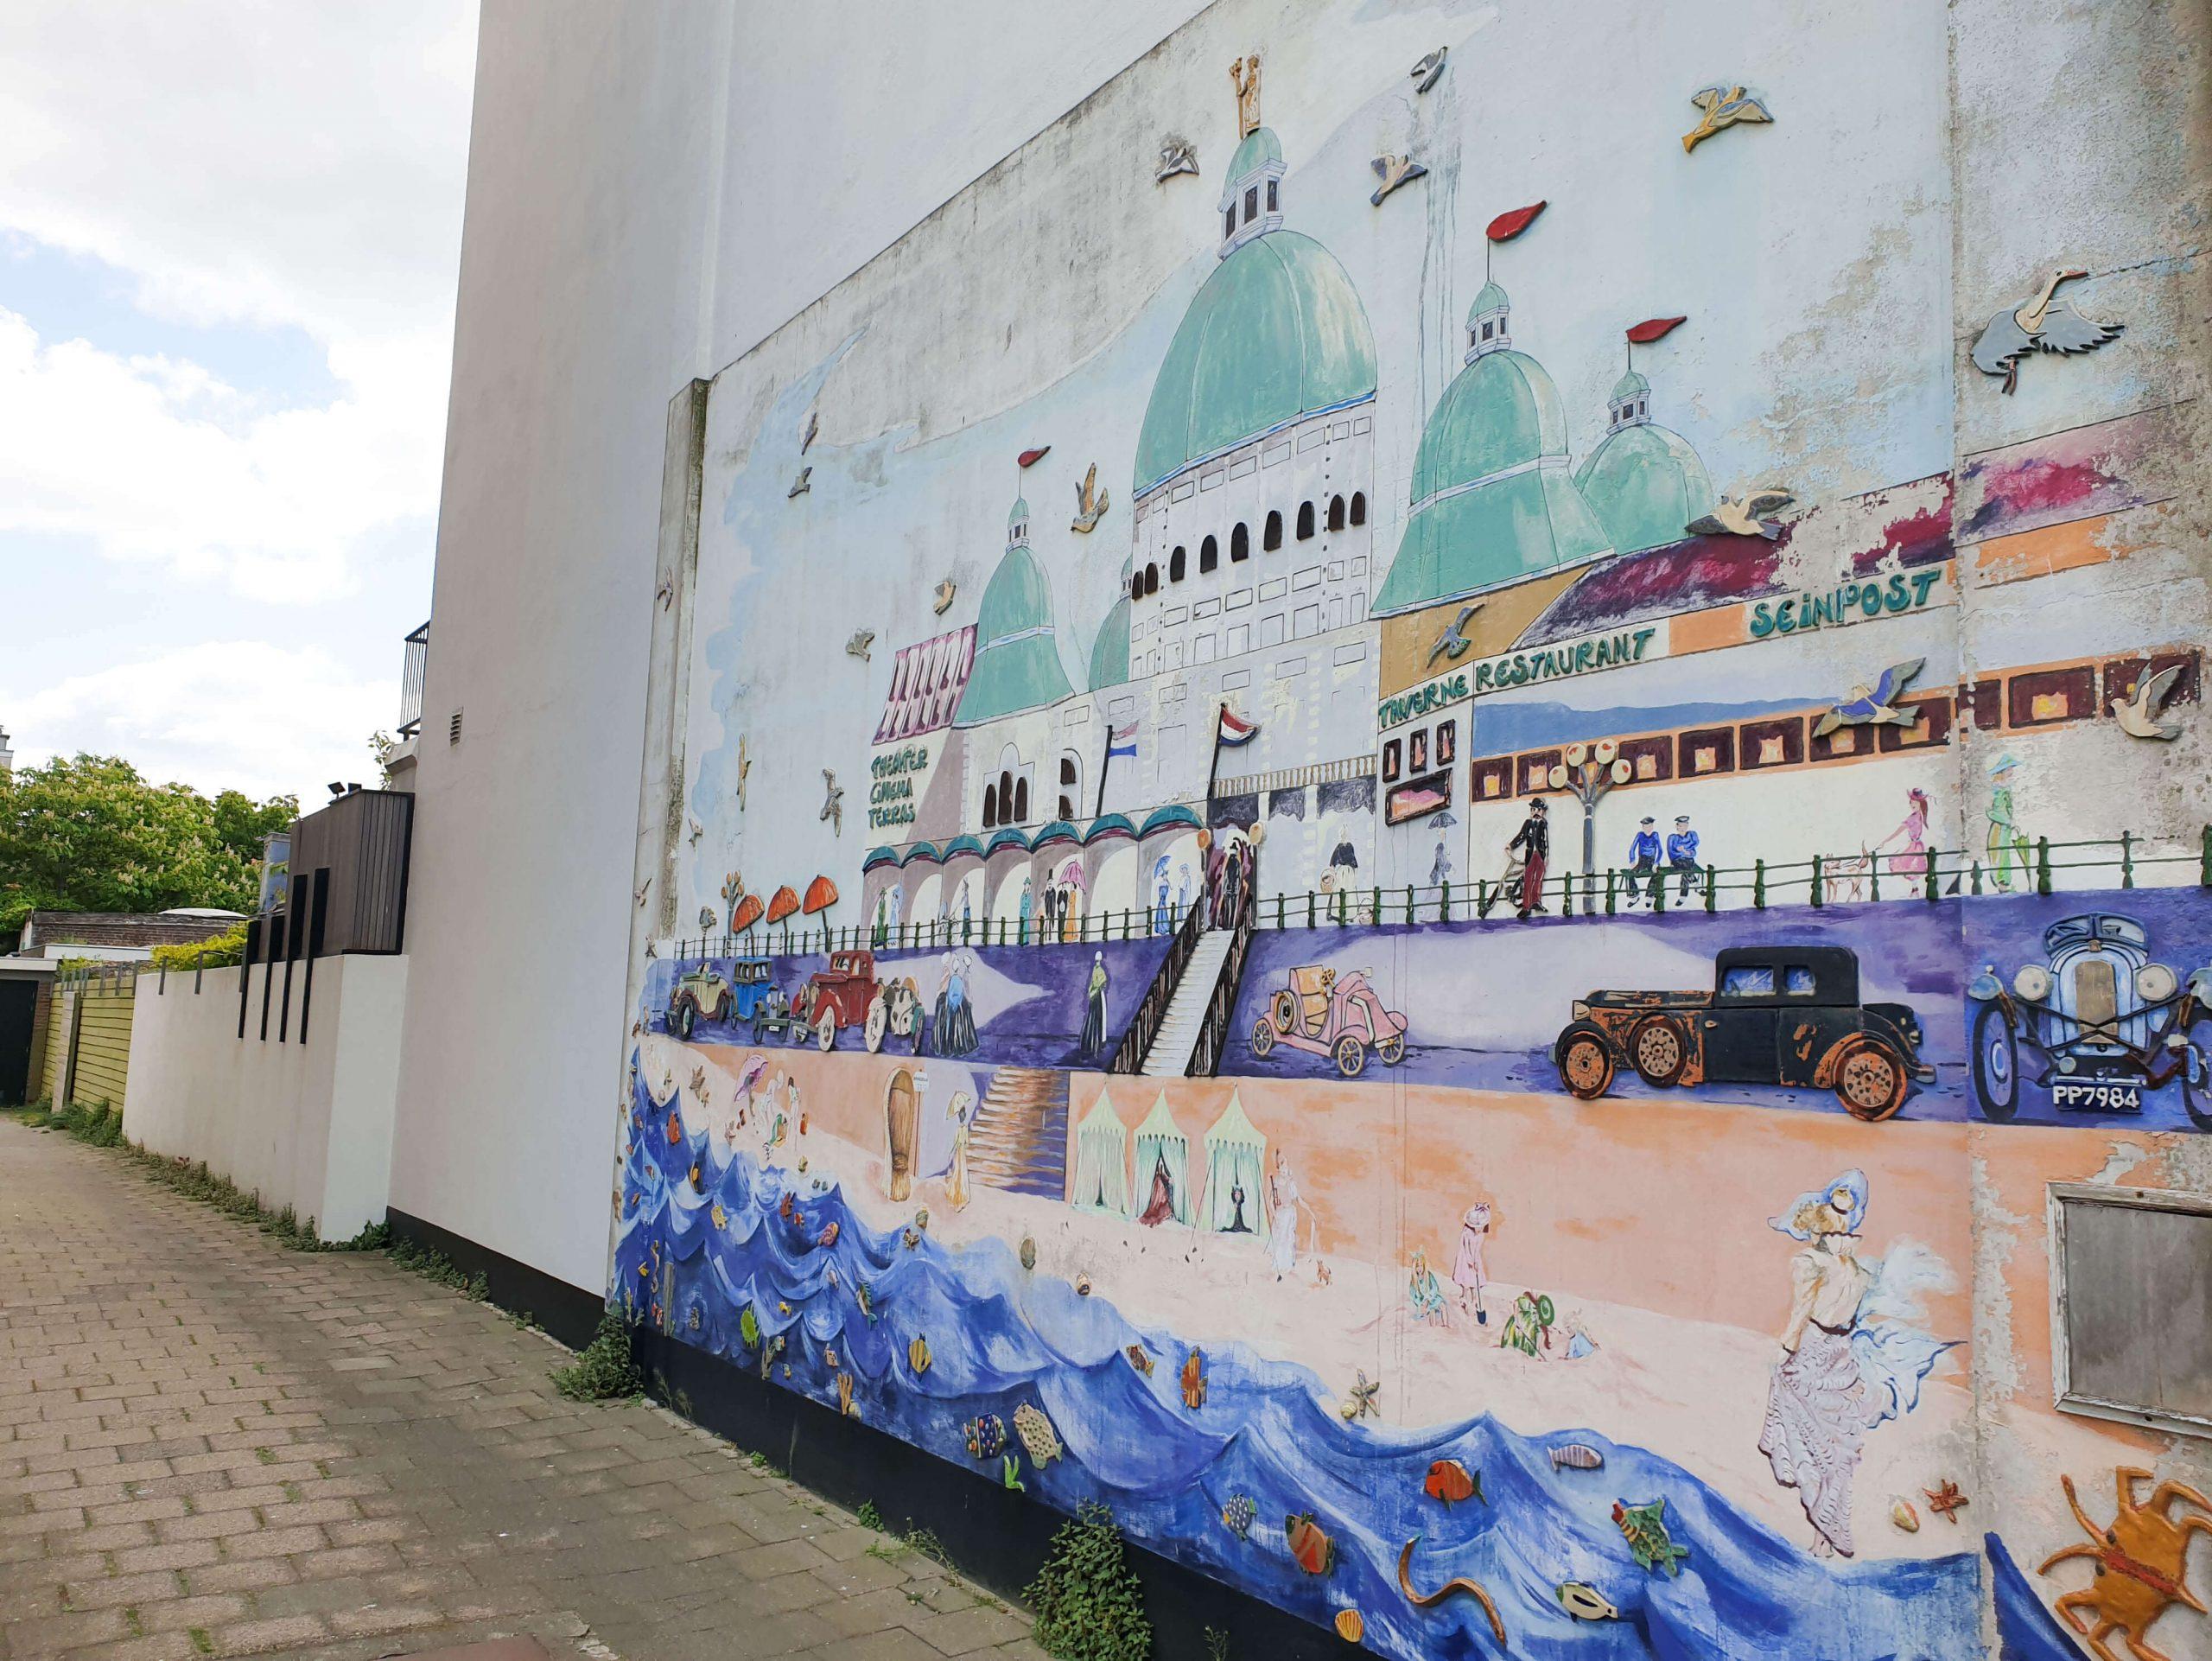 Street Art Gevers Deynootweg